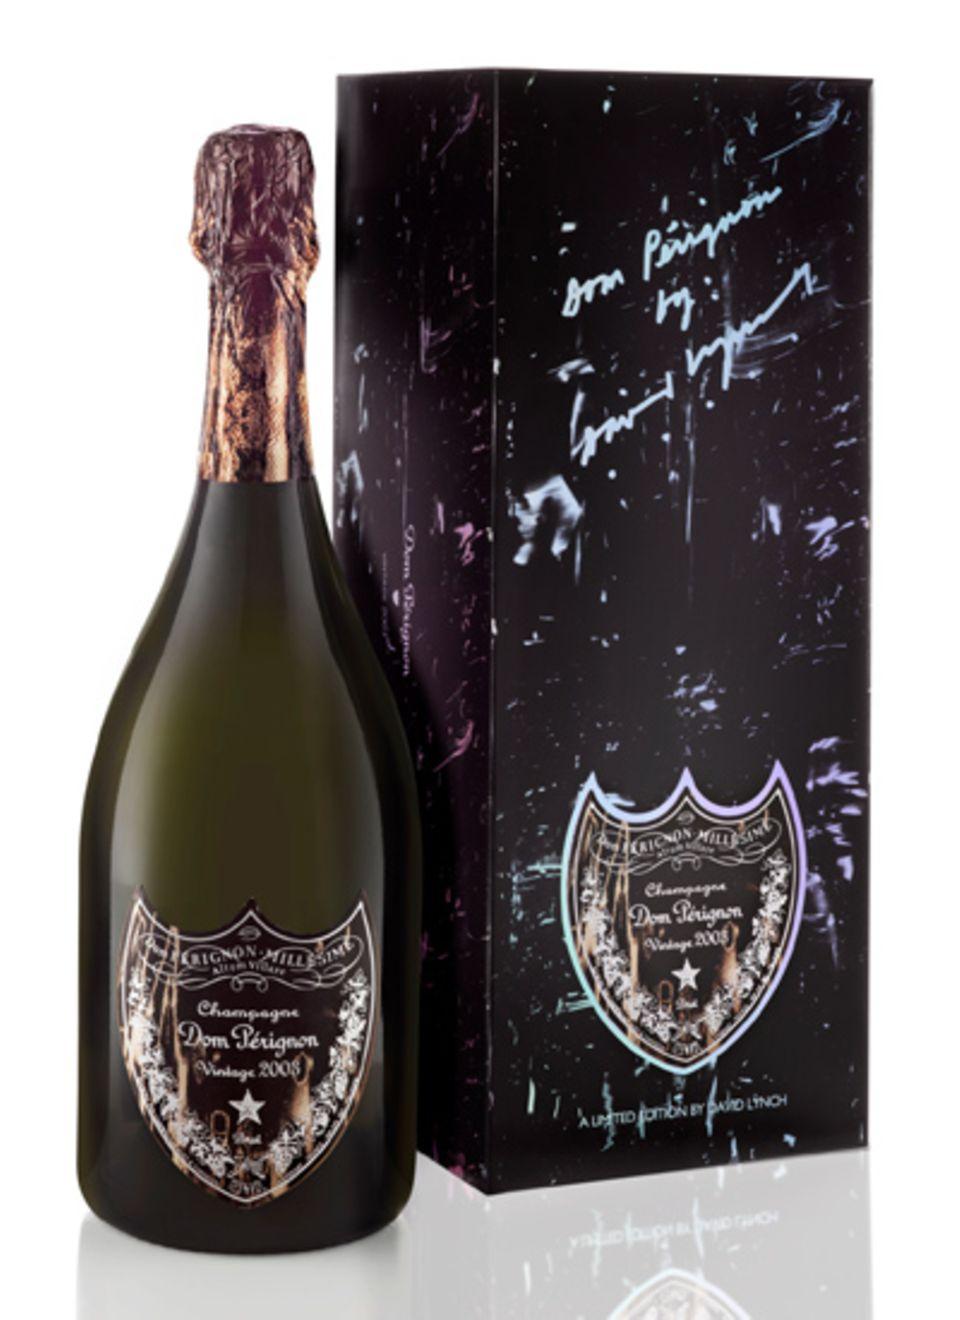 Special Edition Champagner, designt von David Lynch, Dom Pérignon Vintage 2003, ca. 150 Euro oder Dom Pérignon Vintage Rosé 2000